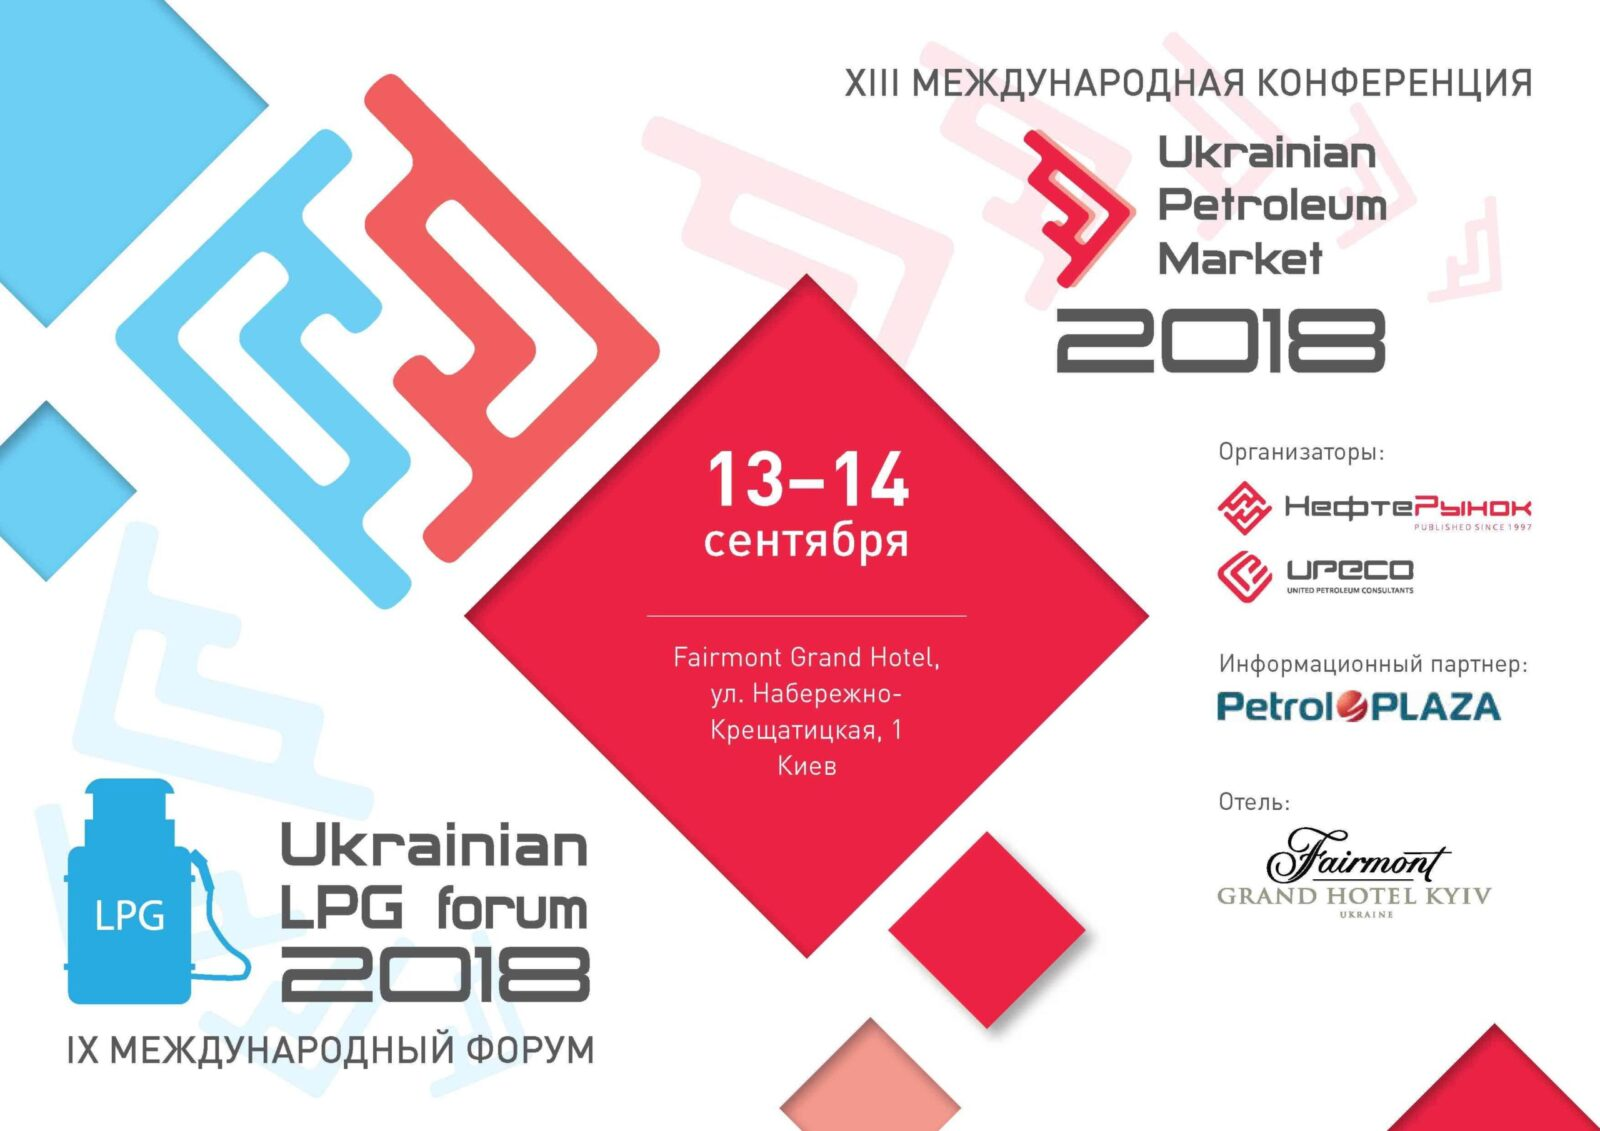 HPC Research Украина приняла участие в IX международном LPG форуме 2018